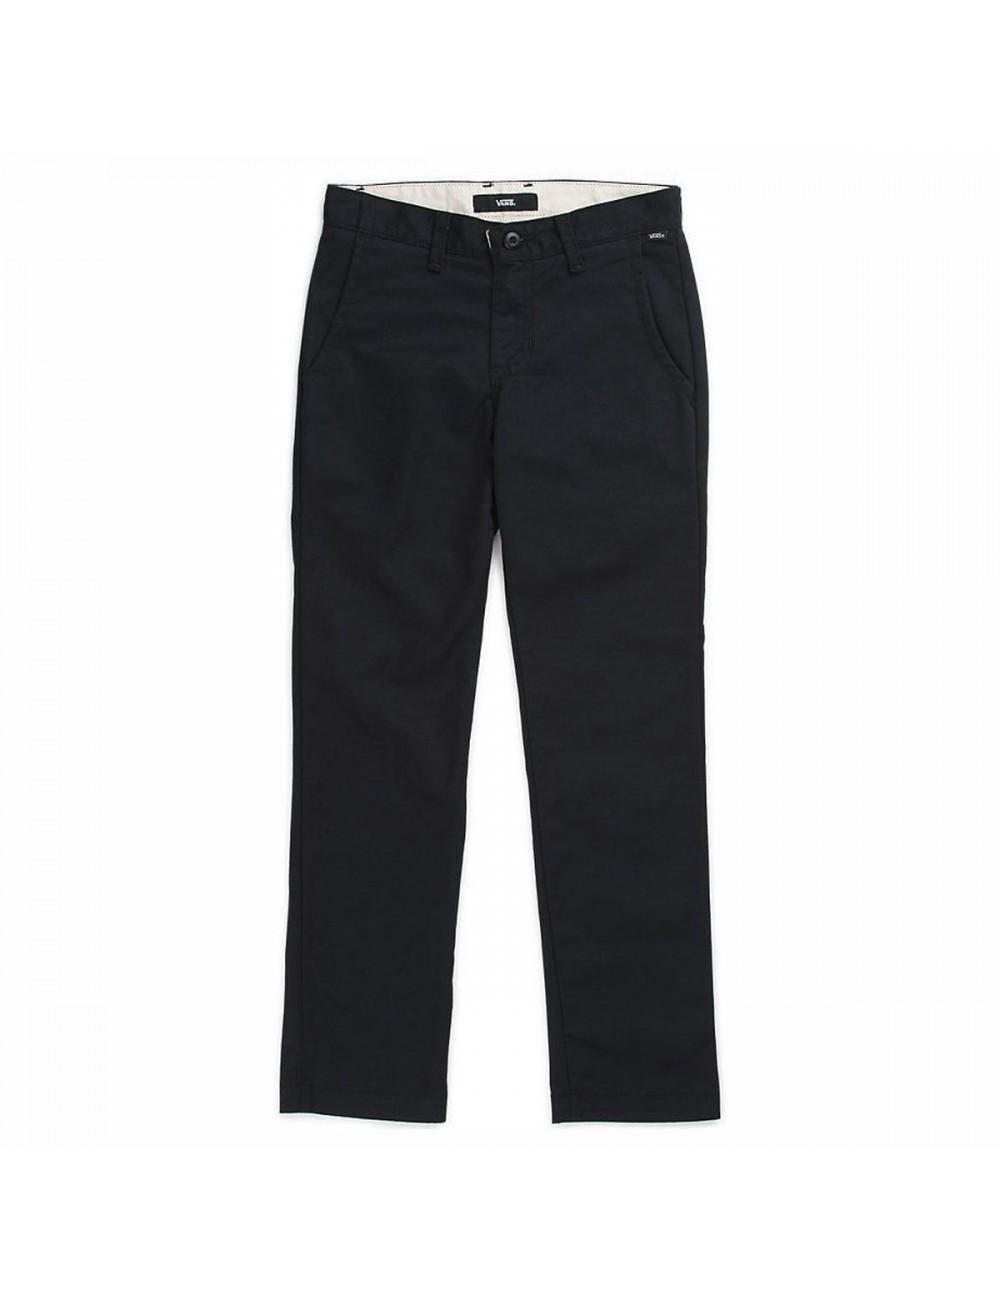 Vans Authentic Chino Pants - Black_11446